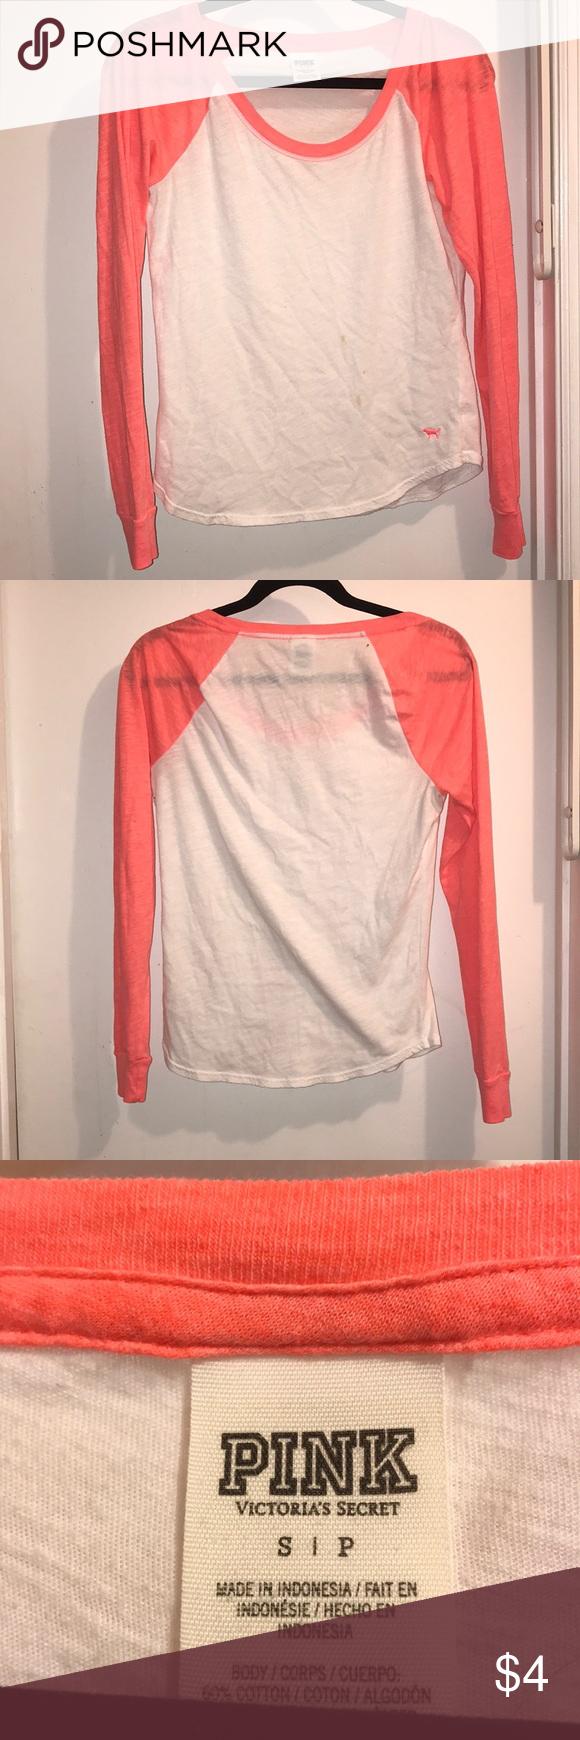 Shirt Pink In 2018 My Posh Closet Pinterest Shirts Pink And